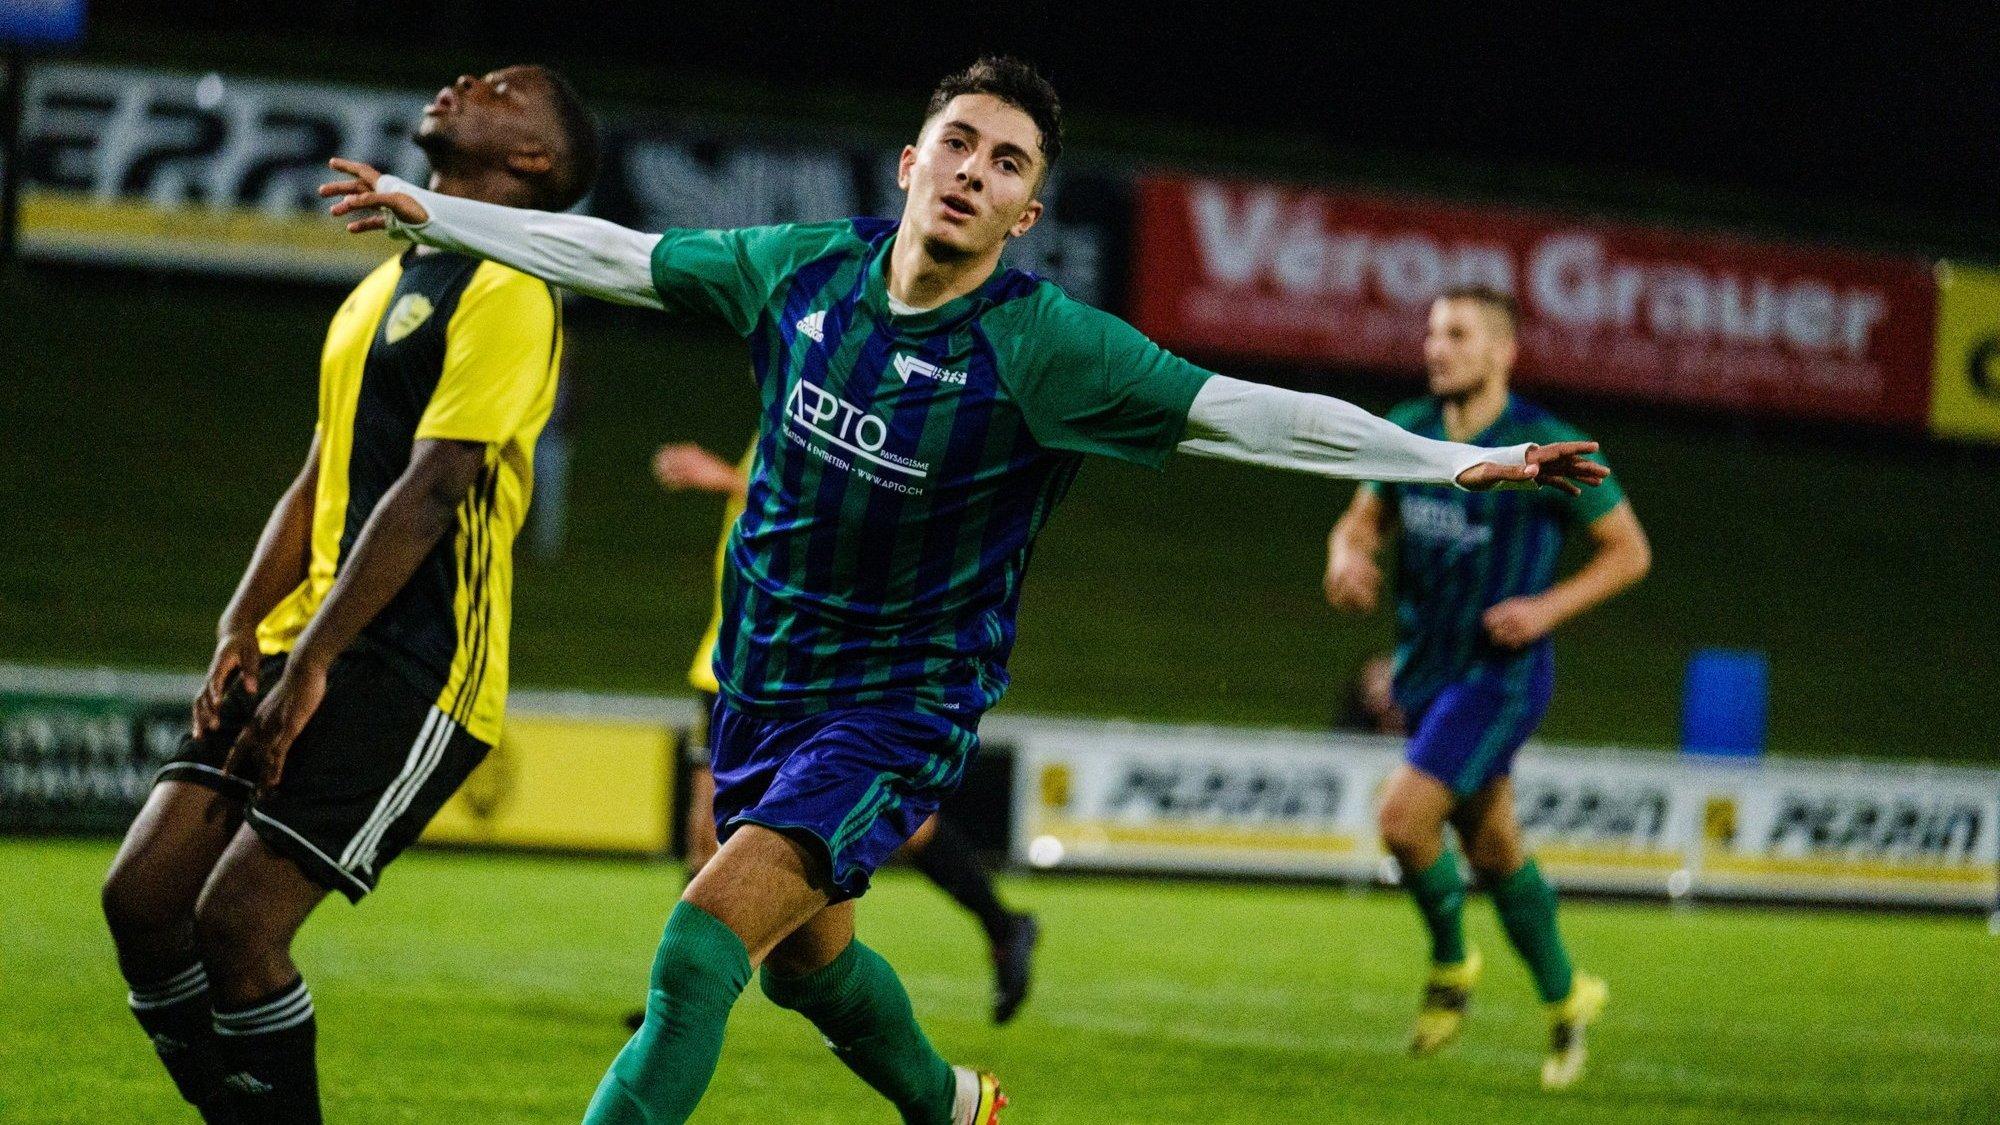 "L'attaquant de Terre Sainte II Günay Cirak a inscrit un joli triplé face à la ""deux"" du Stade Nyonnais."